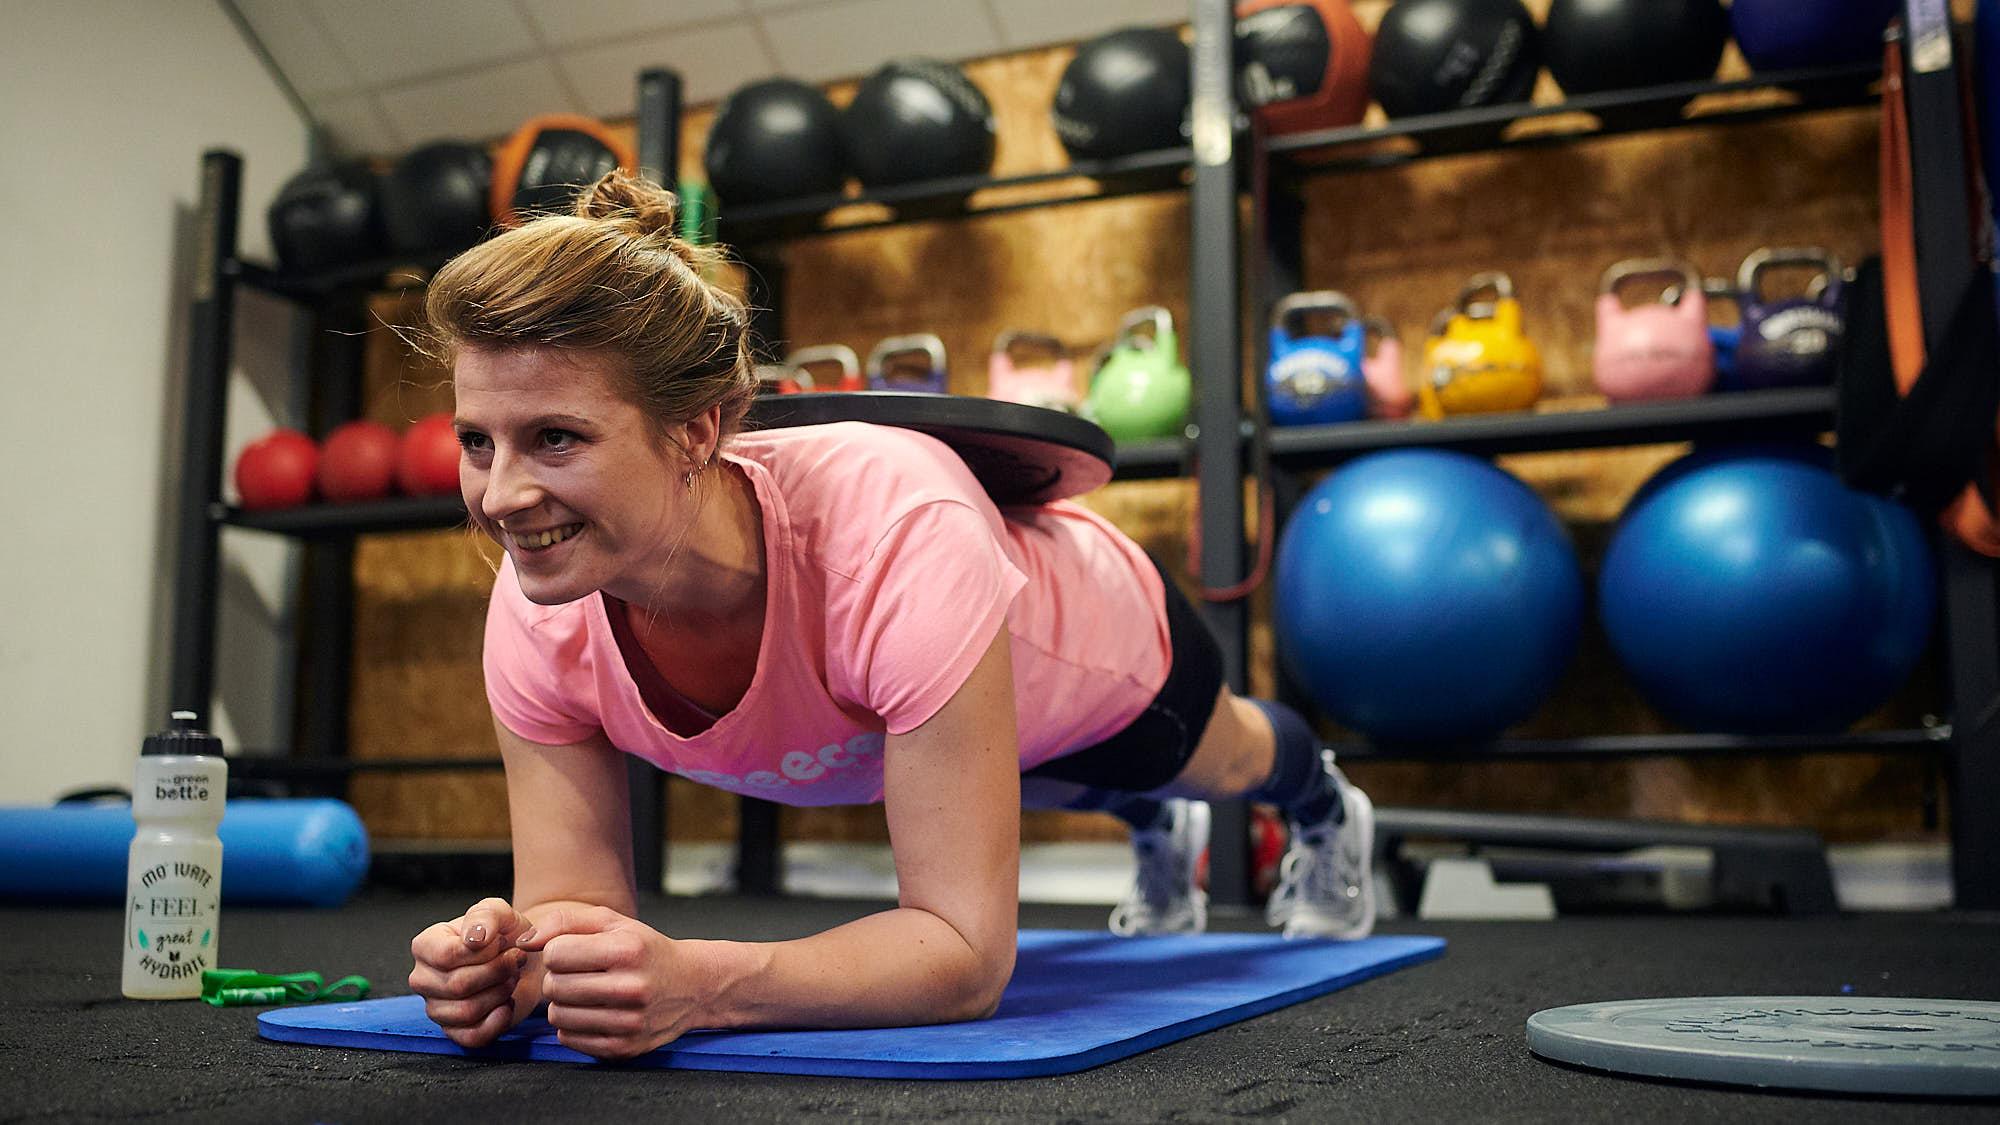 Dutch national women's hockey team keeper Josine Koning working out in a gym